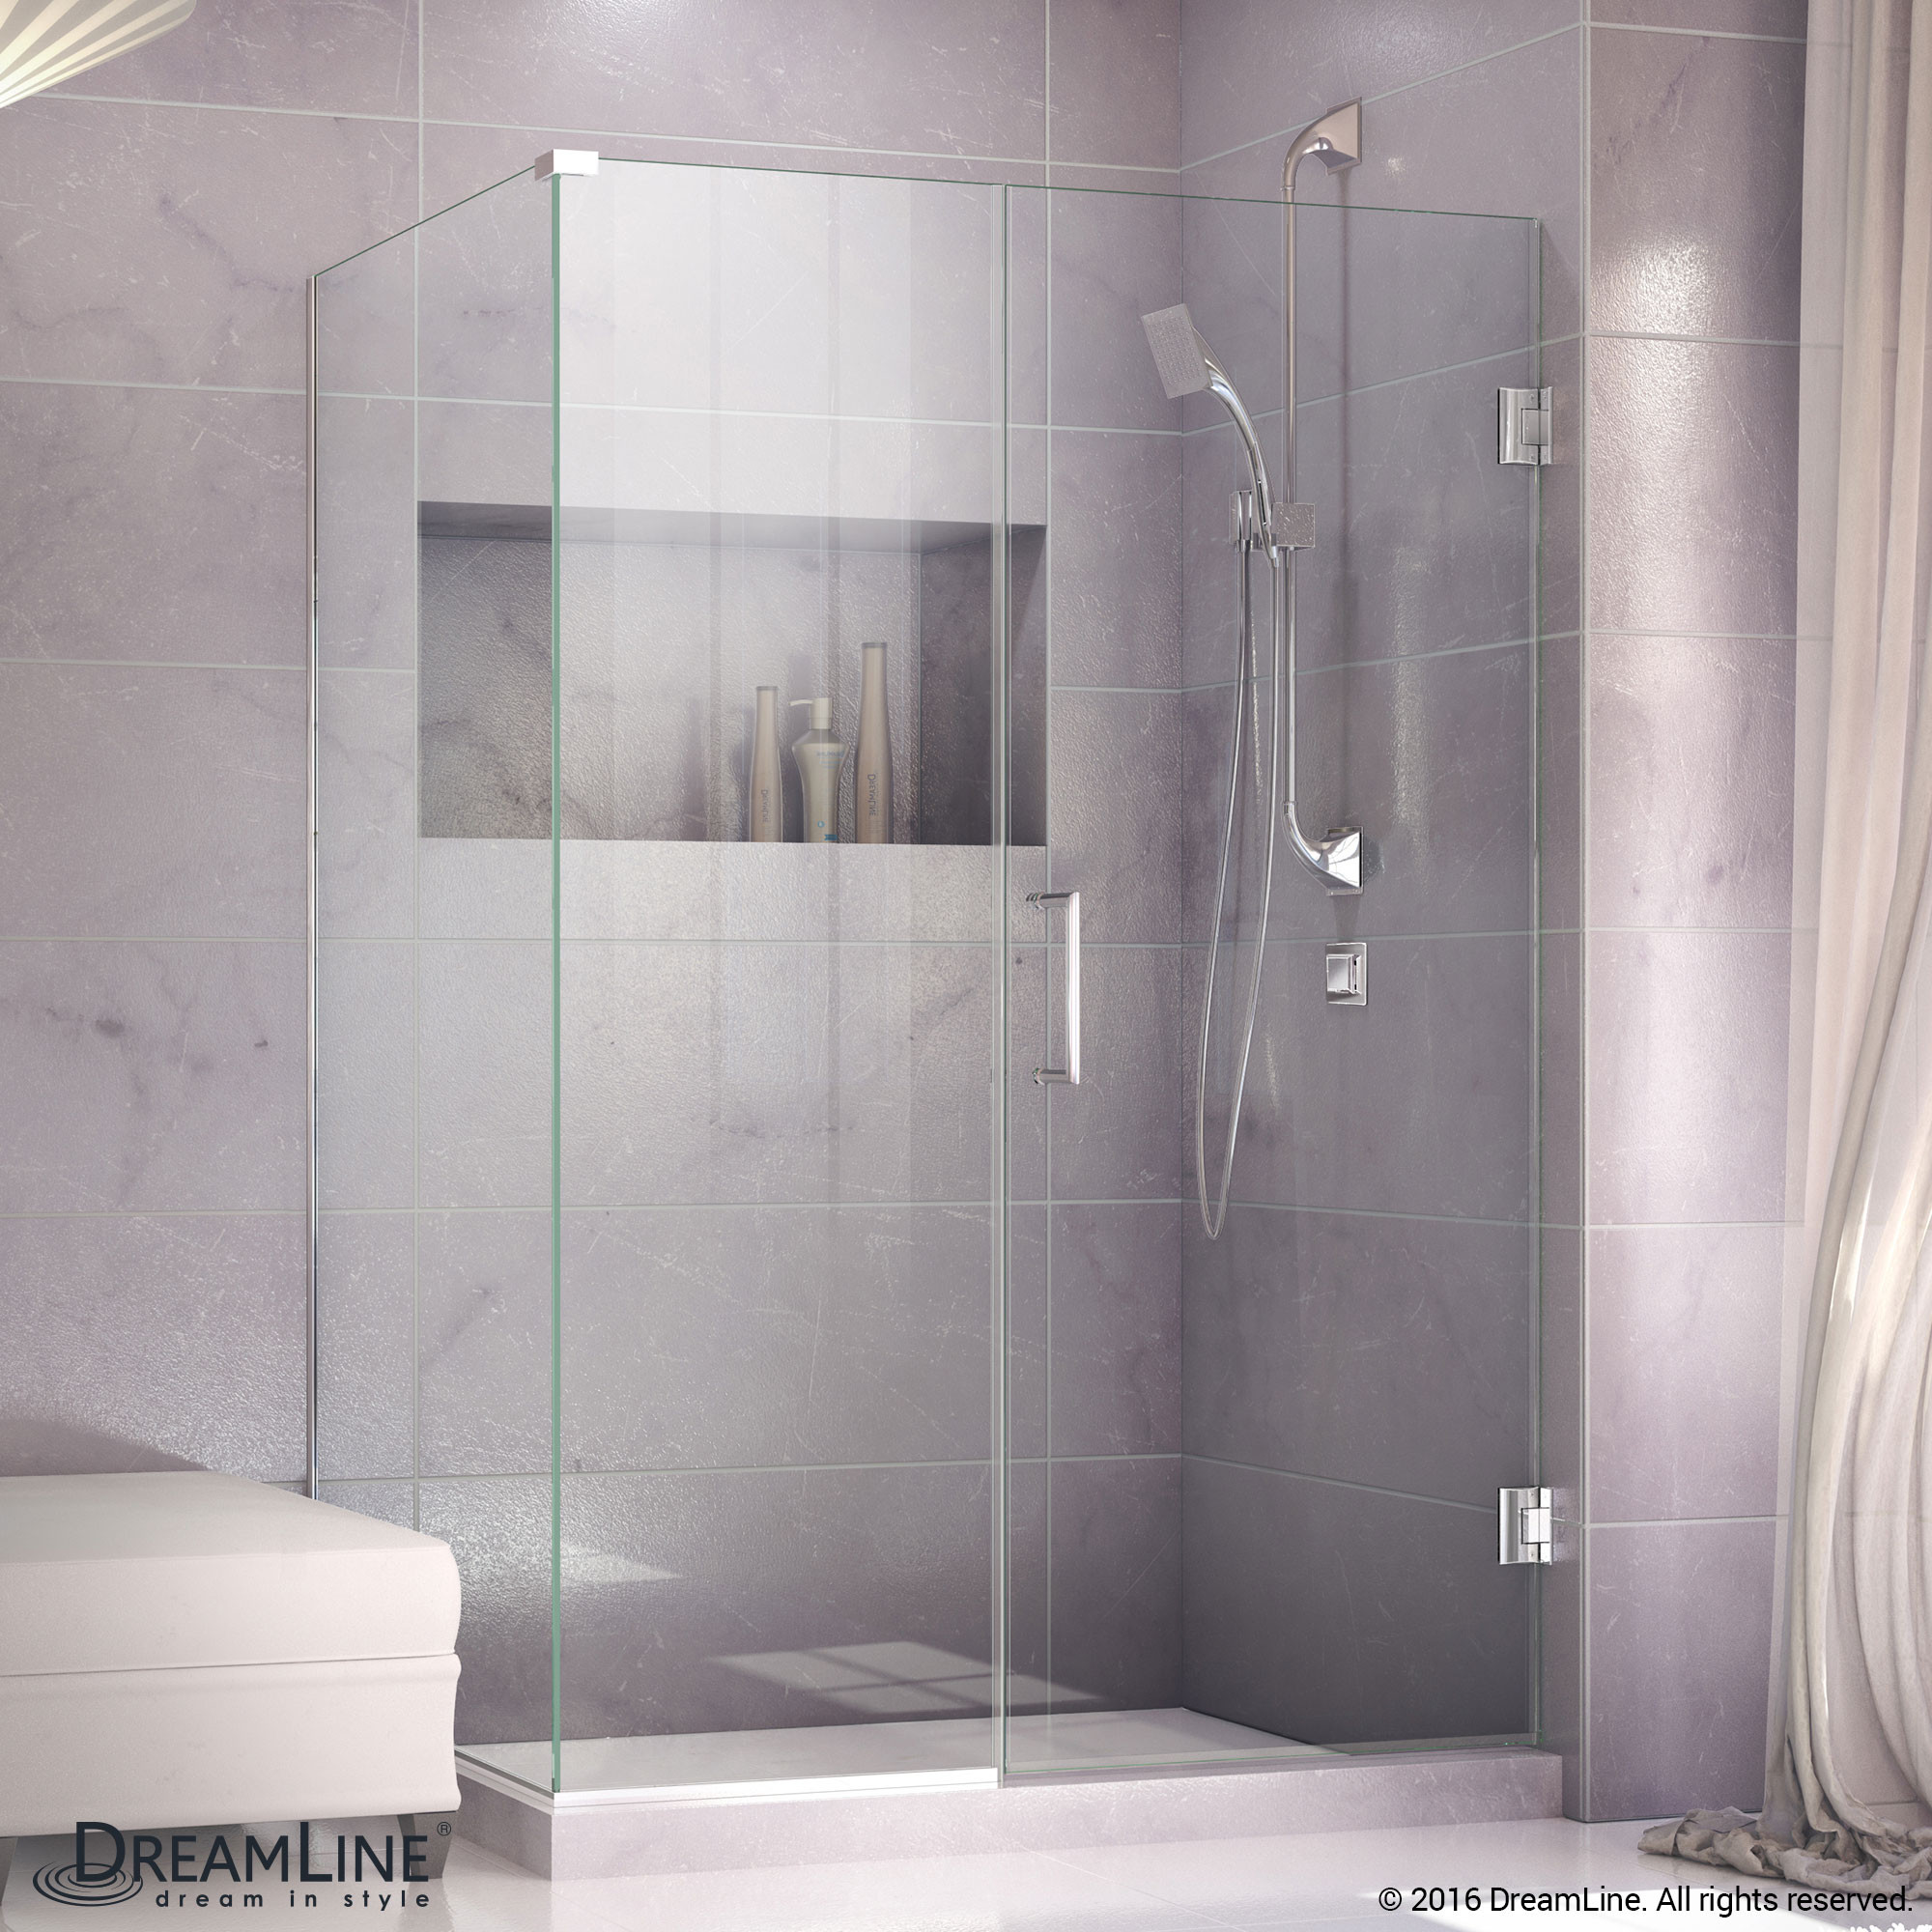 DreamLine SHEN-24445340-01 Unidoor Plus Hinged Shower Enclosure In Chrome Finish Hardware